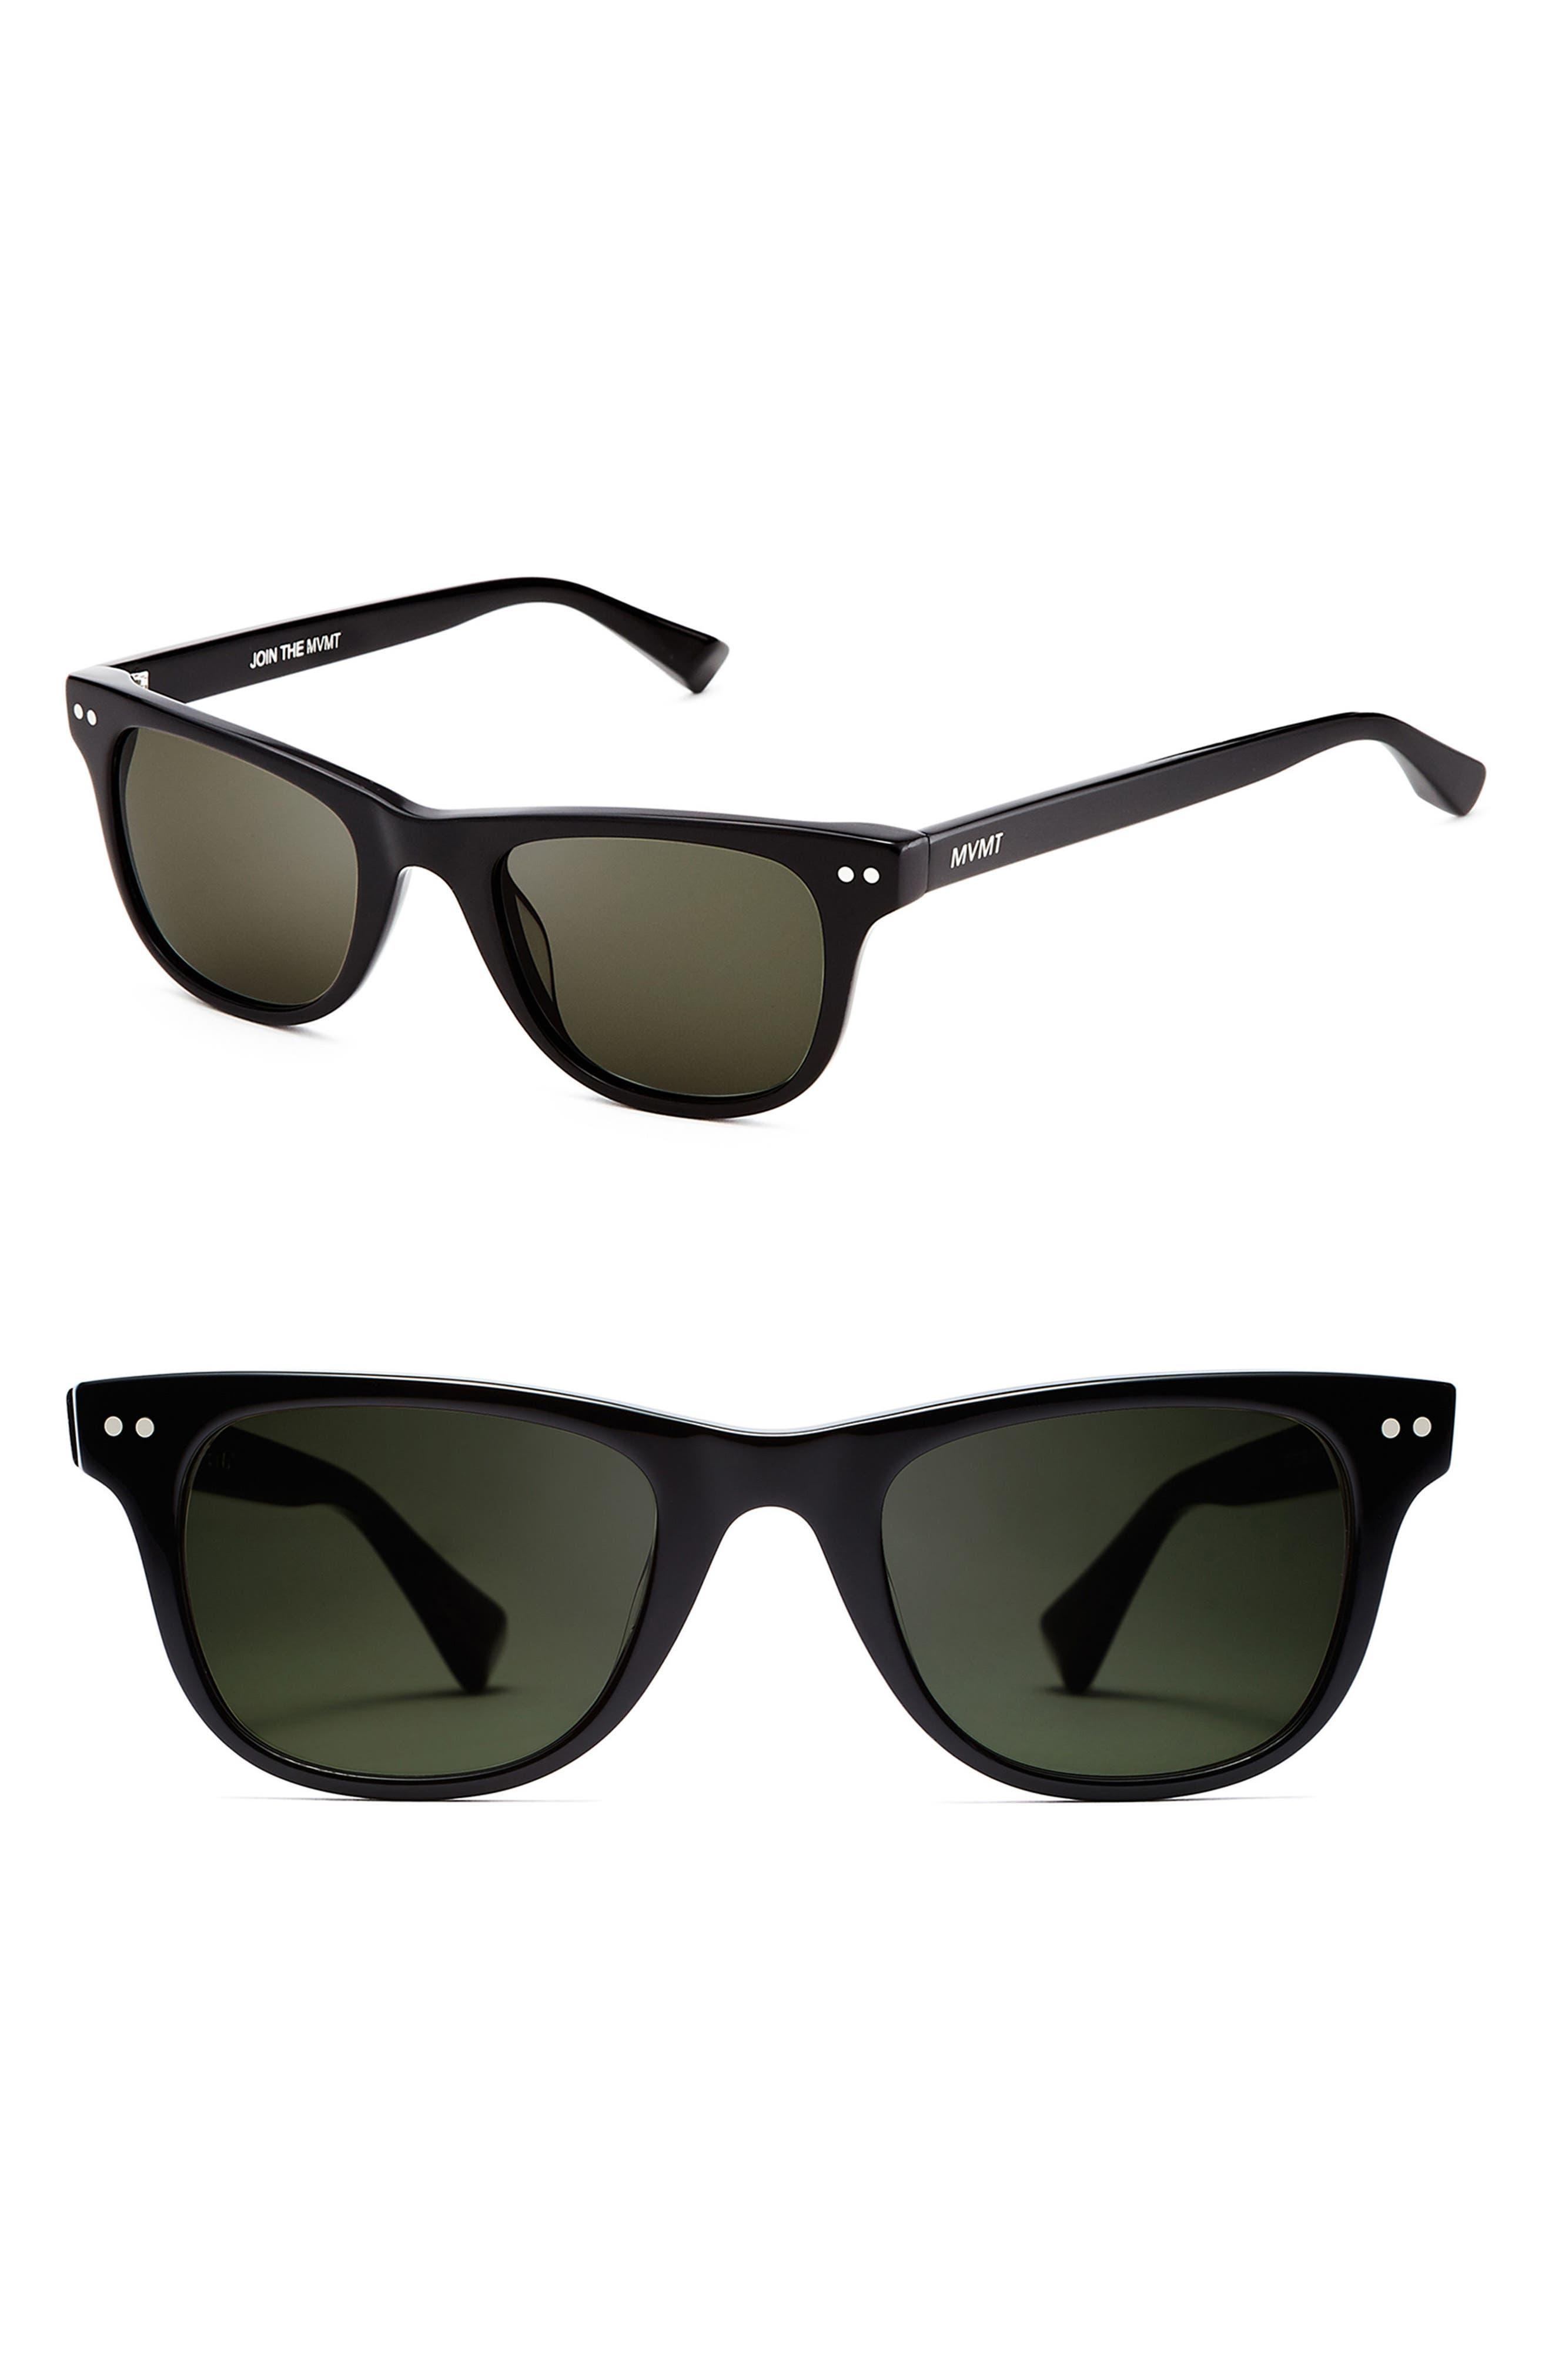 Outsider 51mm Polarized Sunglasses,                             Main thumbnail 1, color,                             Pure Black